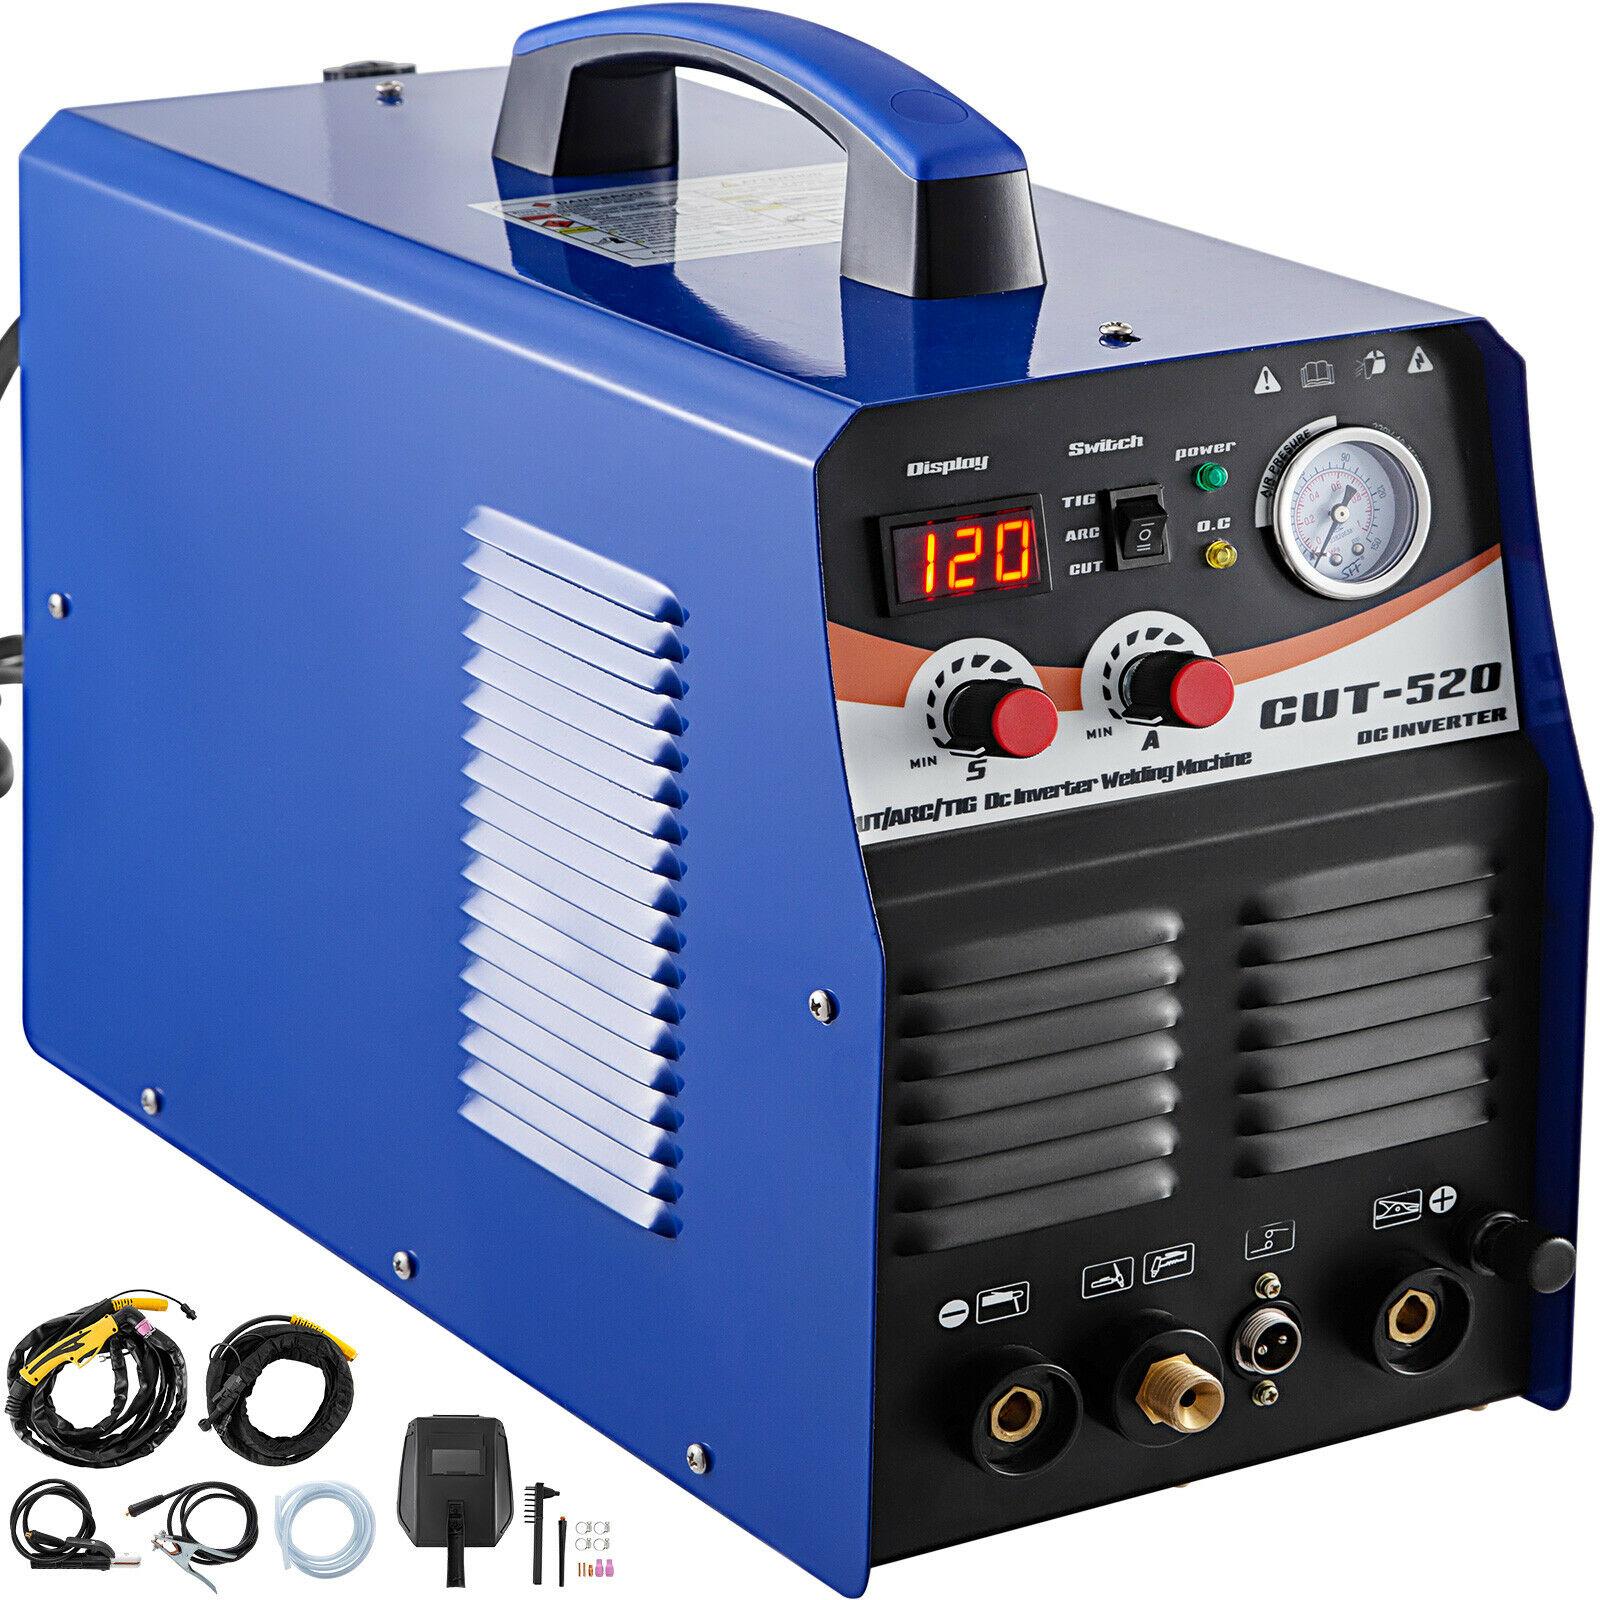 TIG/MMA Plasma Cutter CT520 3 In 1 Combo Welding Machine Tig Welder 200A Arc Welder 200A Plasma Cutter 50A 110V 220V